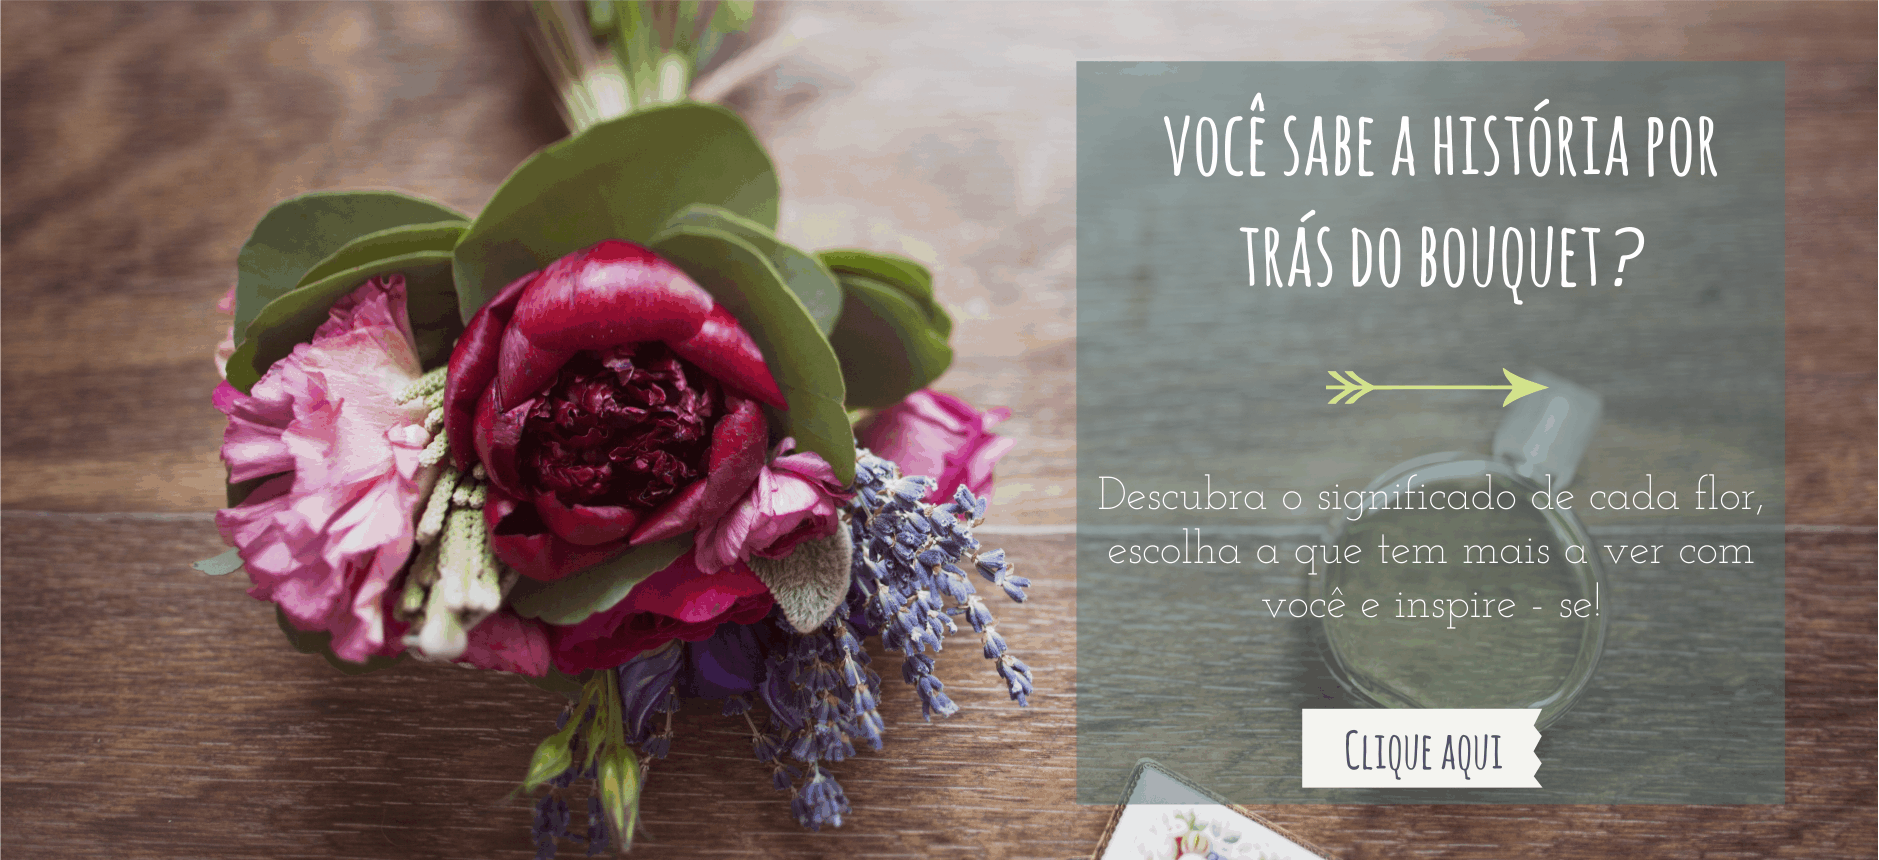 bouquetflores2_banner.png